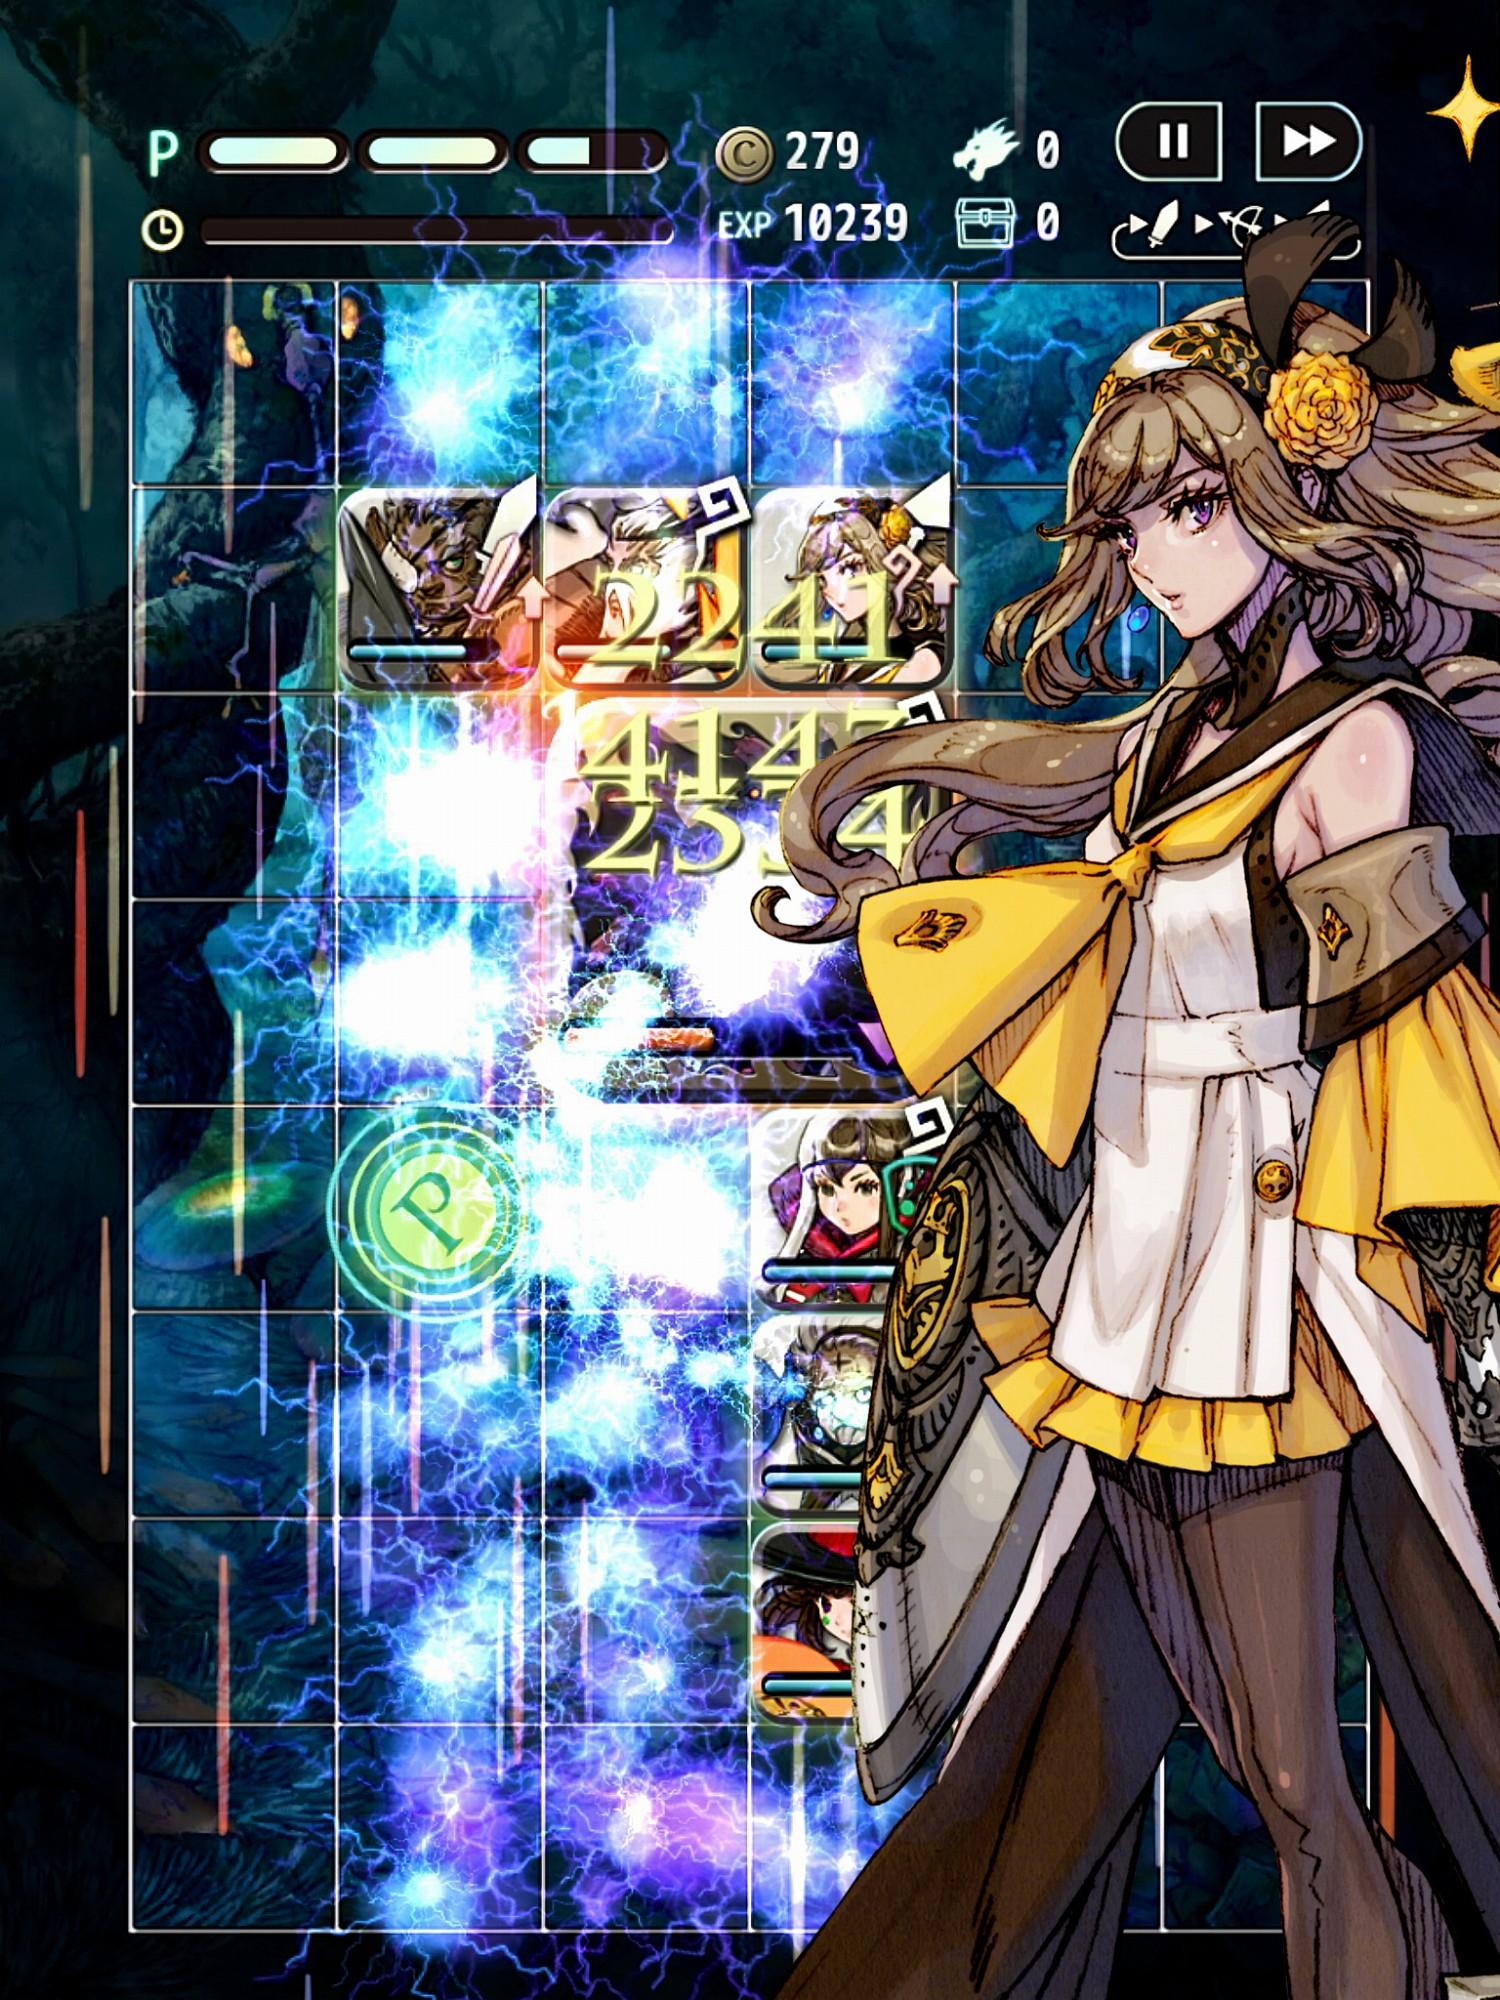 Terra-Battle_2014_08-27-14_003